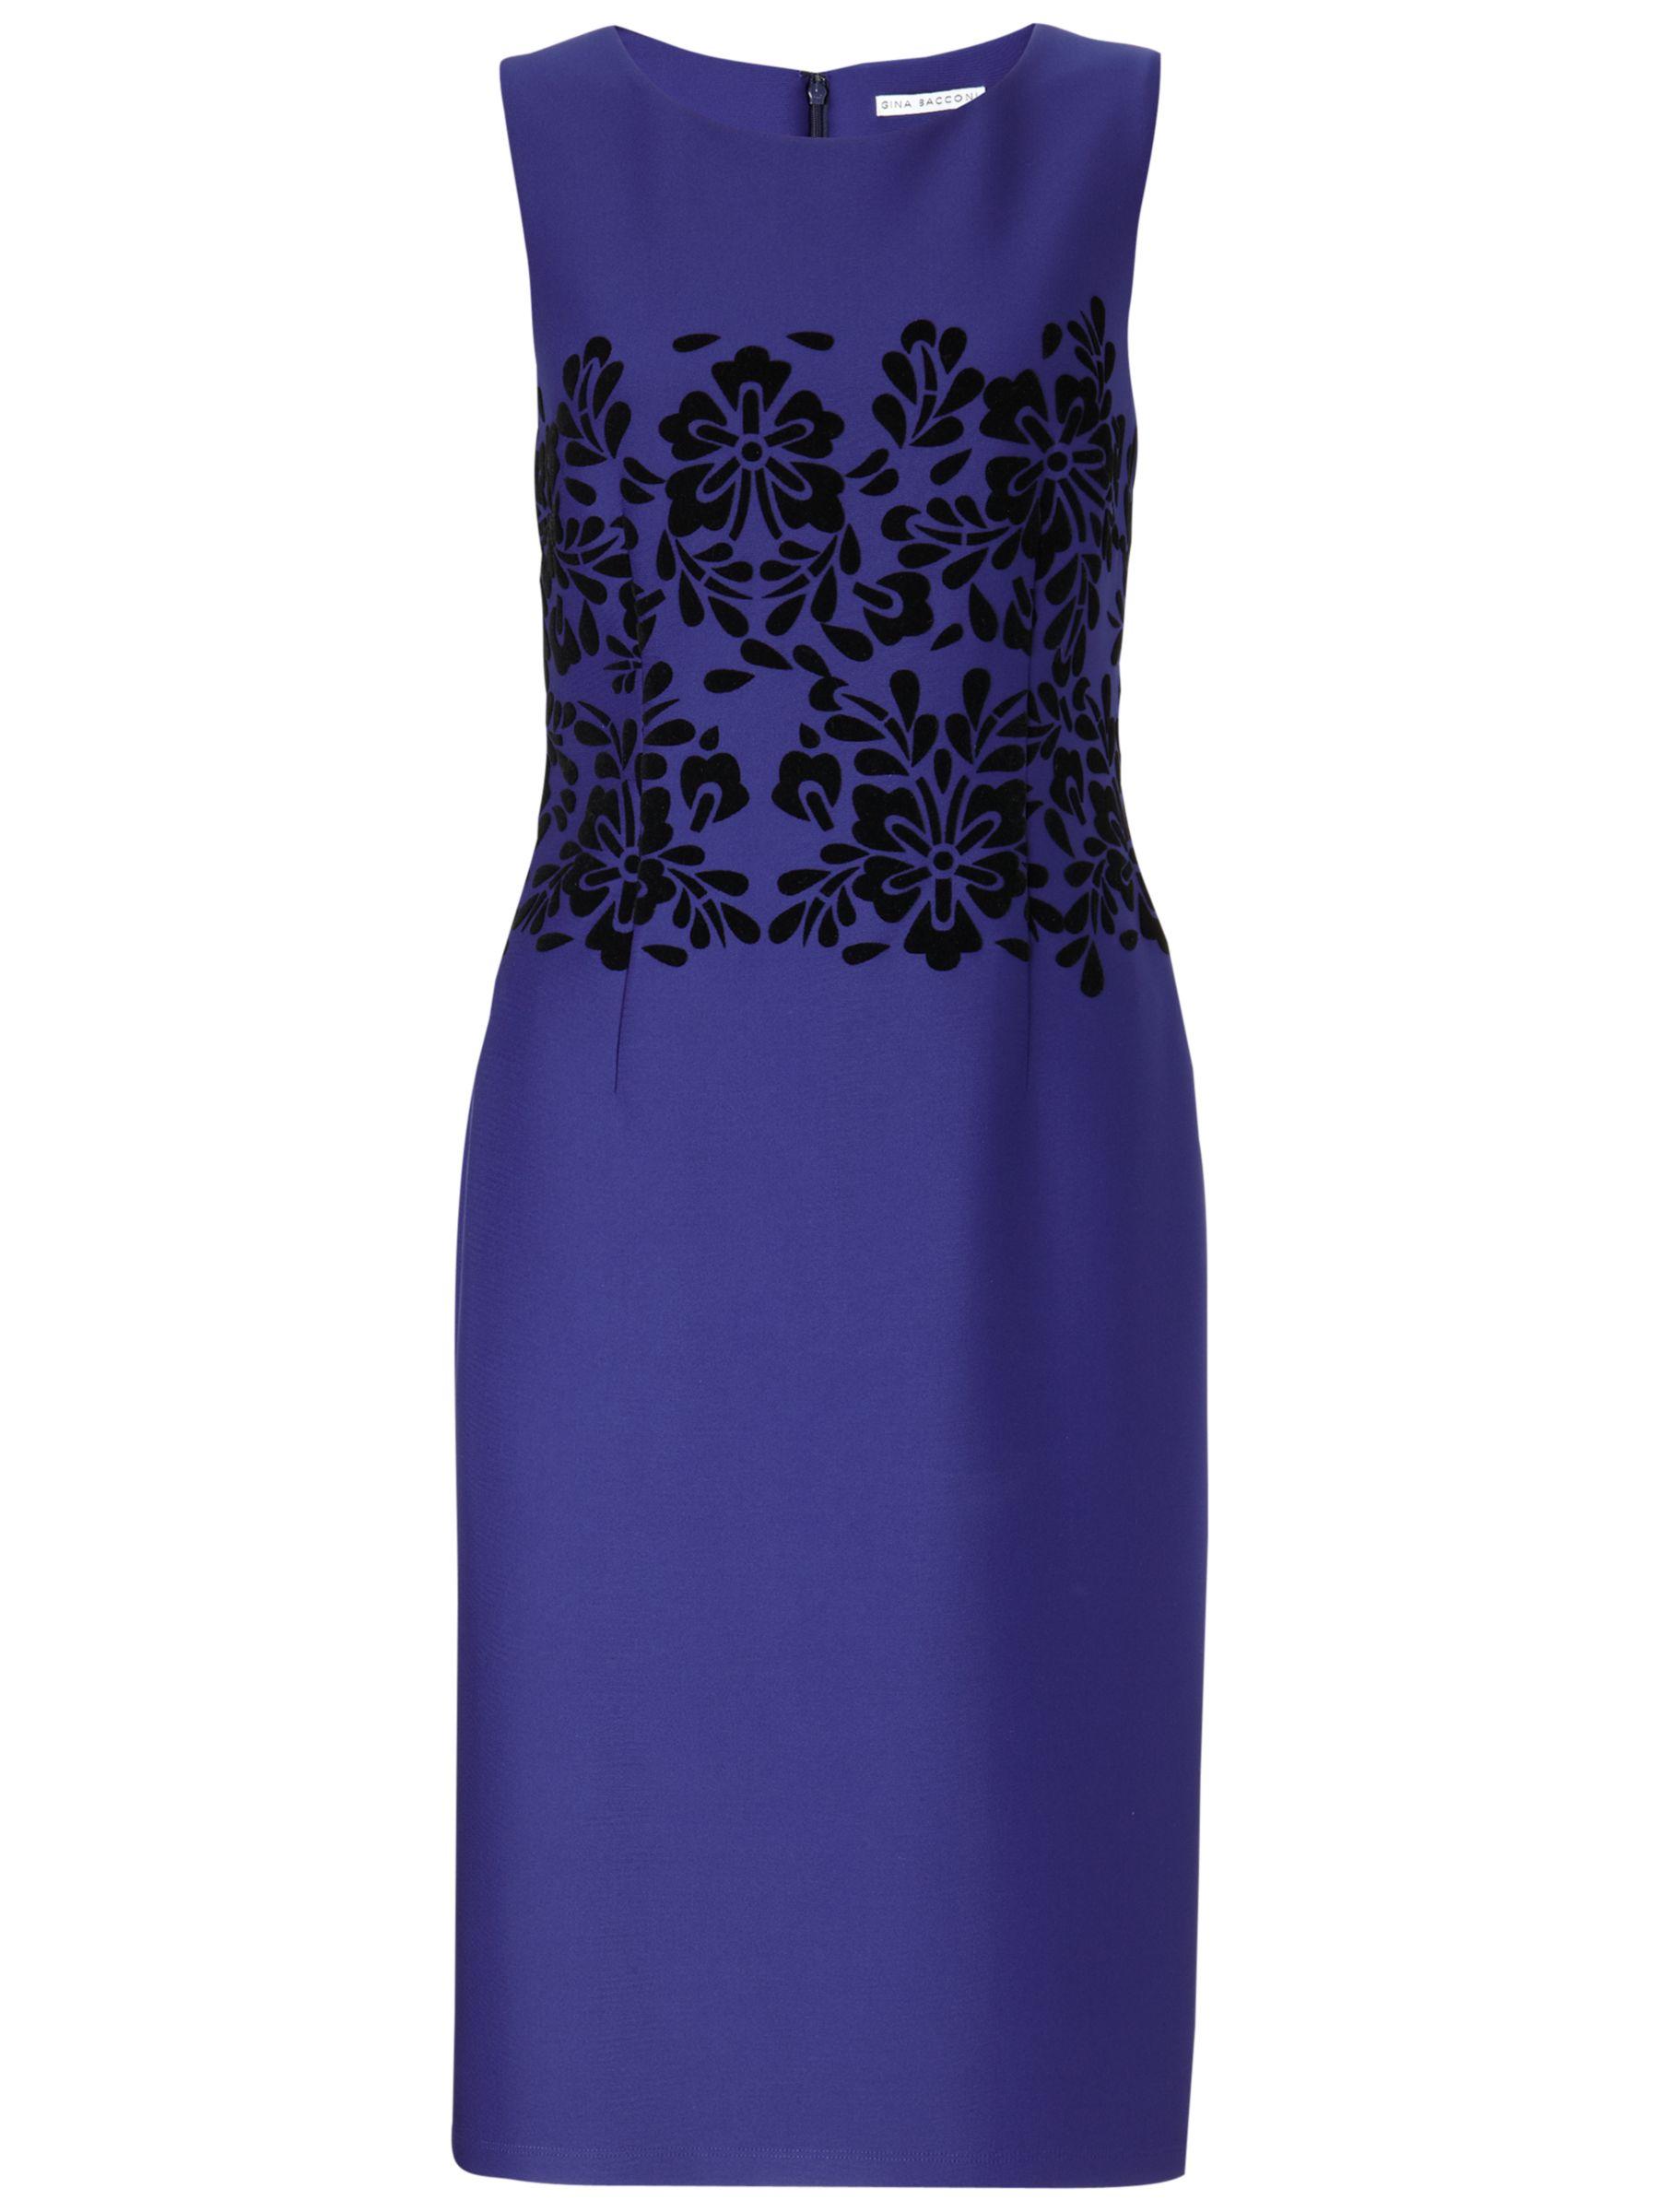 Gina Bacconi Flocked Waist Detail Dress, Blue